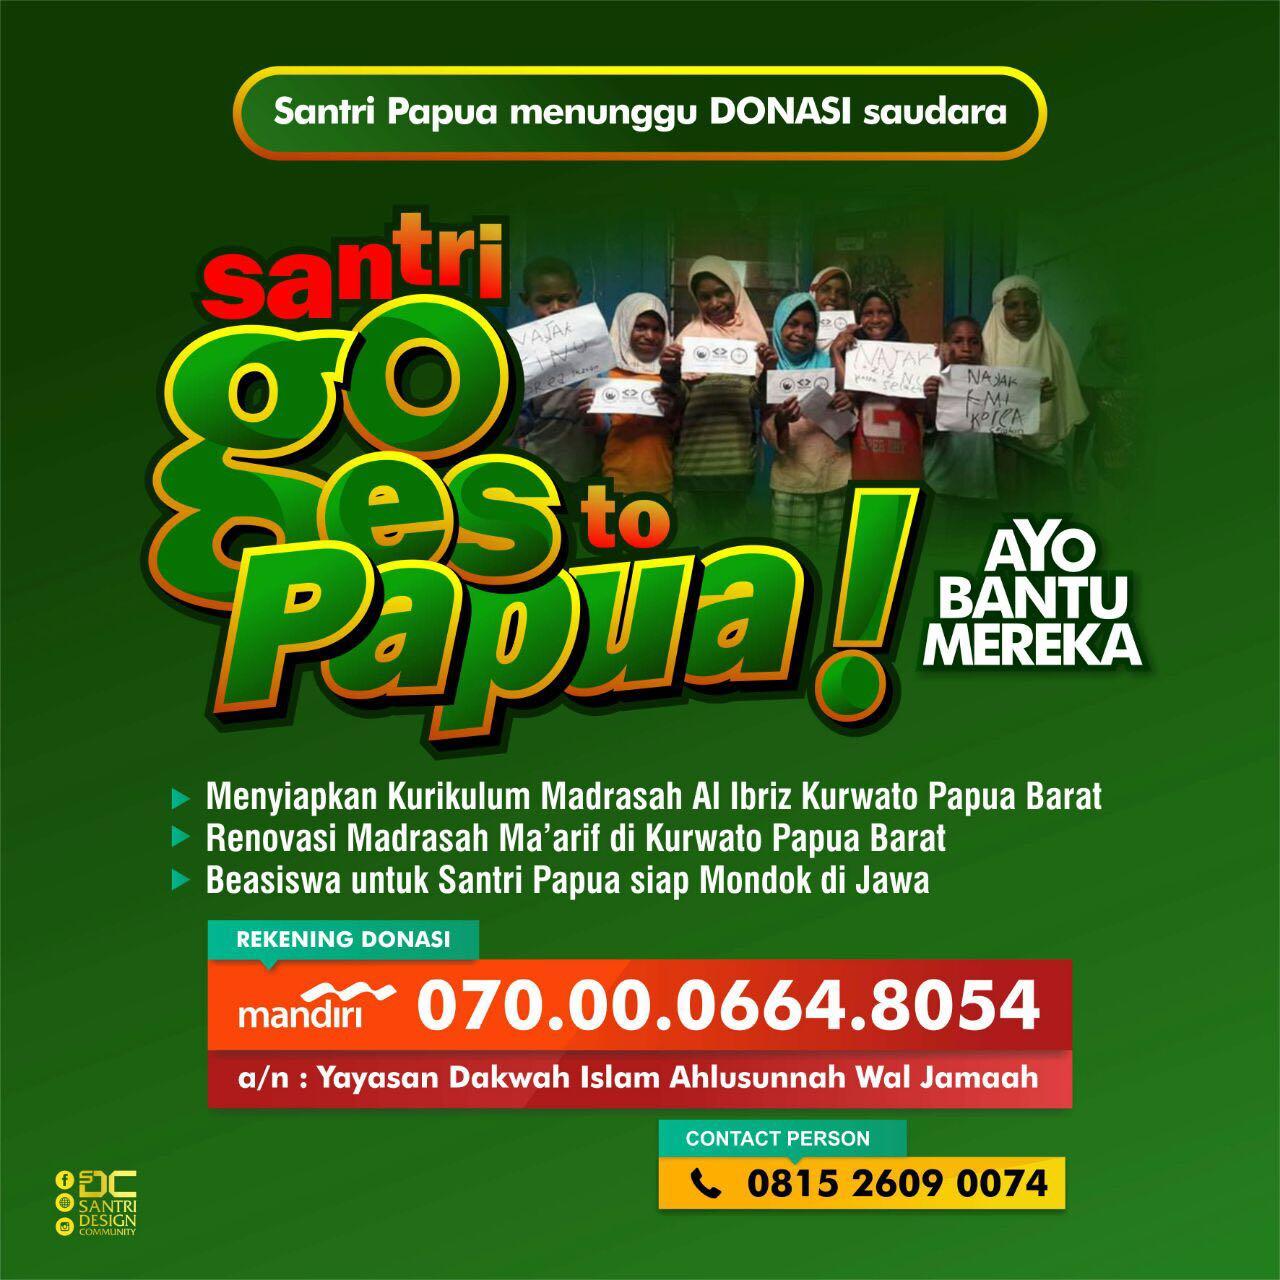 Dibutuhkan Segera: Ustadz NU di Kabupaten Paniai Propinsi Papua